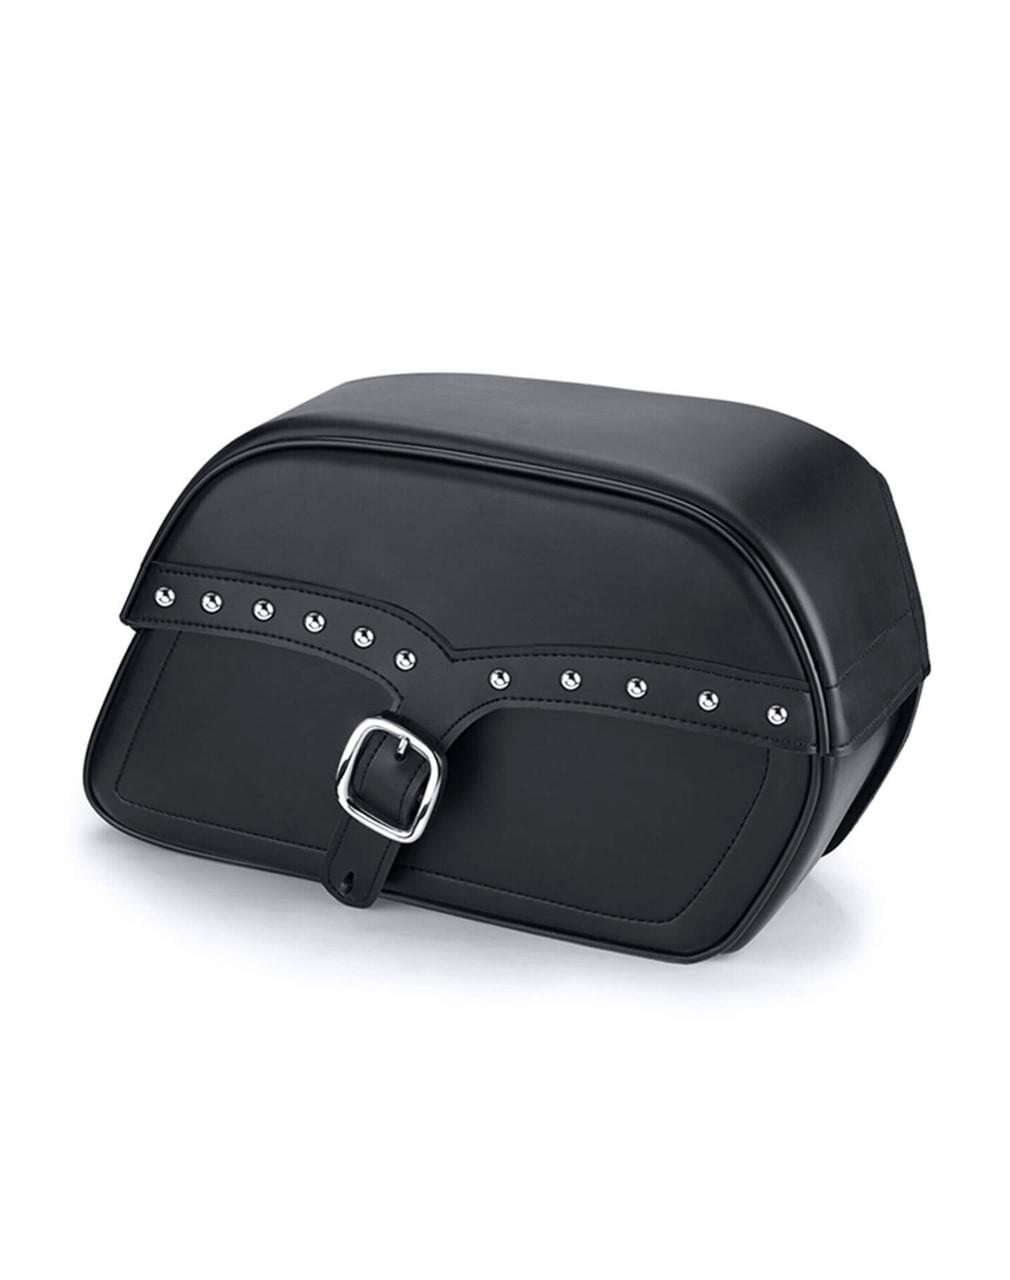 Indian Chief Standard Medium Studded Single Strap Motorcycle Saddlebags Main Bag View